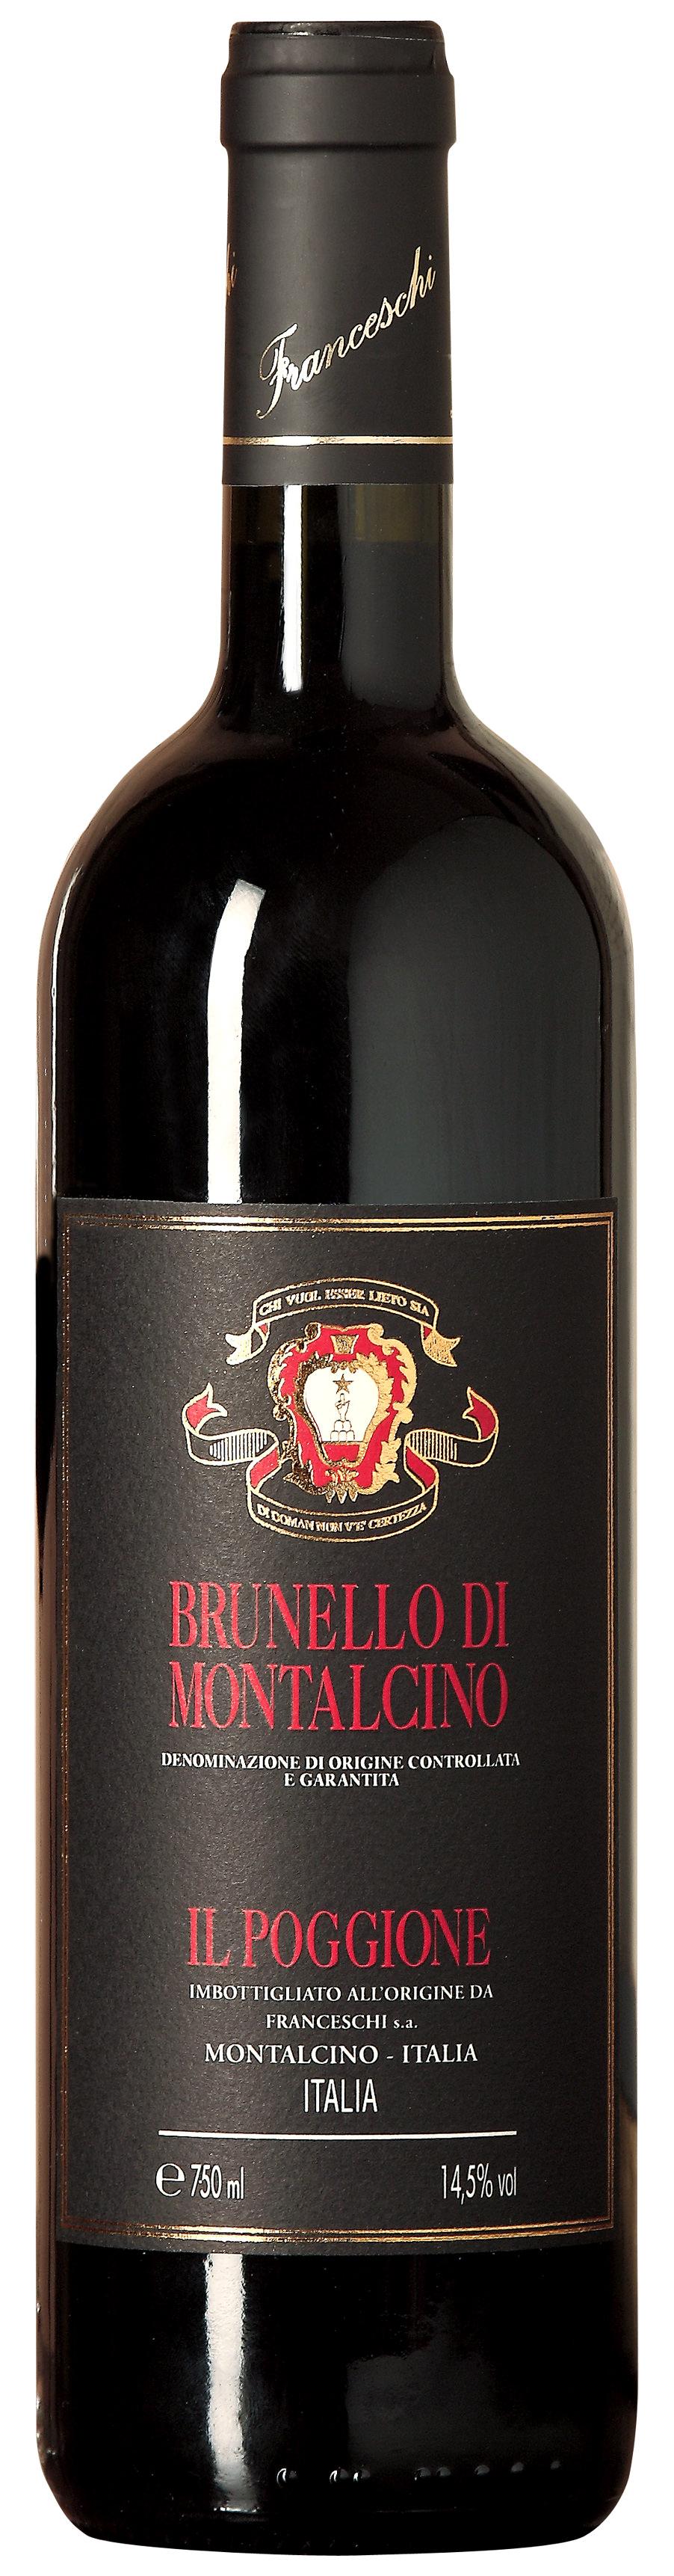 Brunello-2010